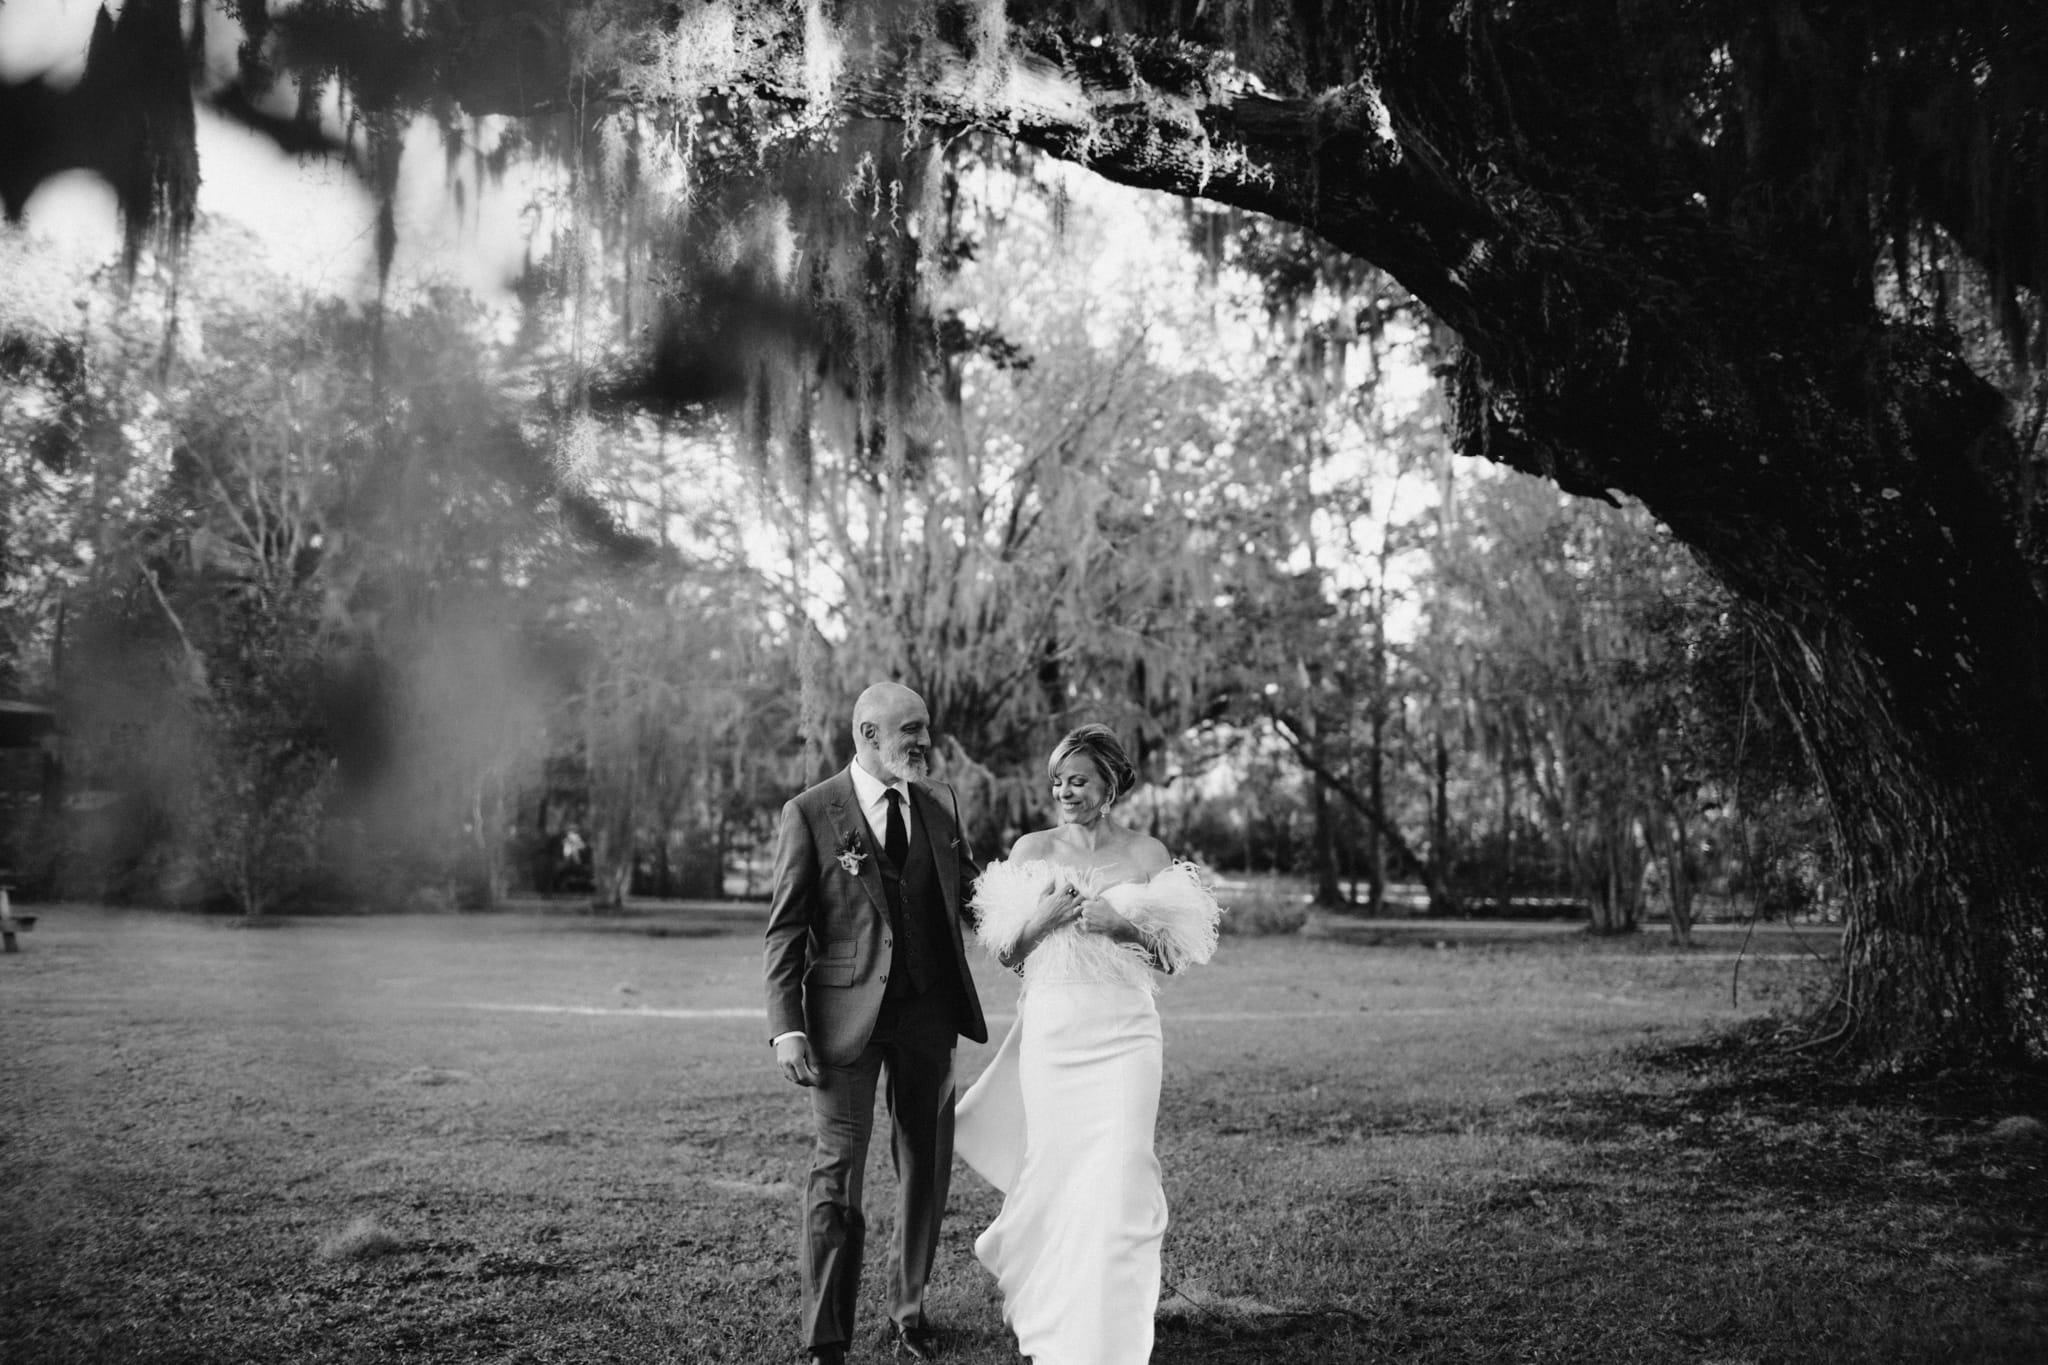 Magnolia-plantation-wedding-charleston-sc-9.jpg